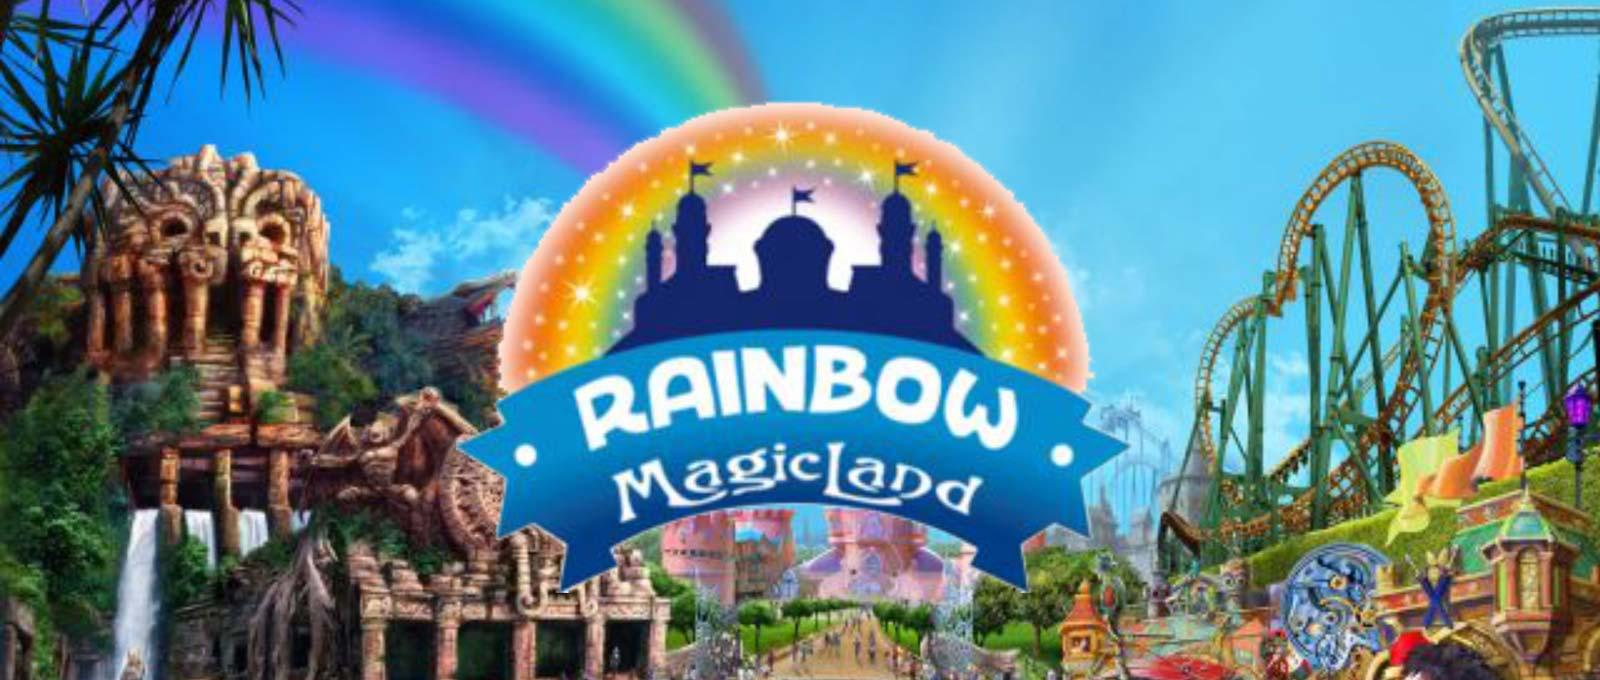 Rainbow MagicLand Valmontone